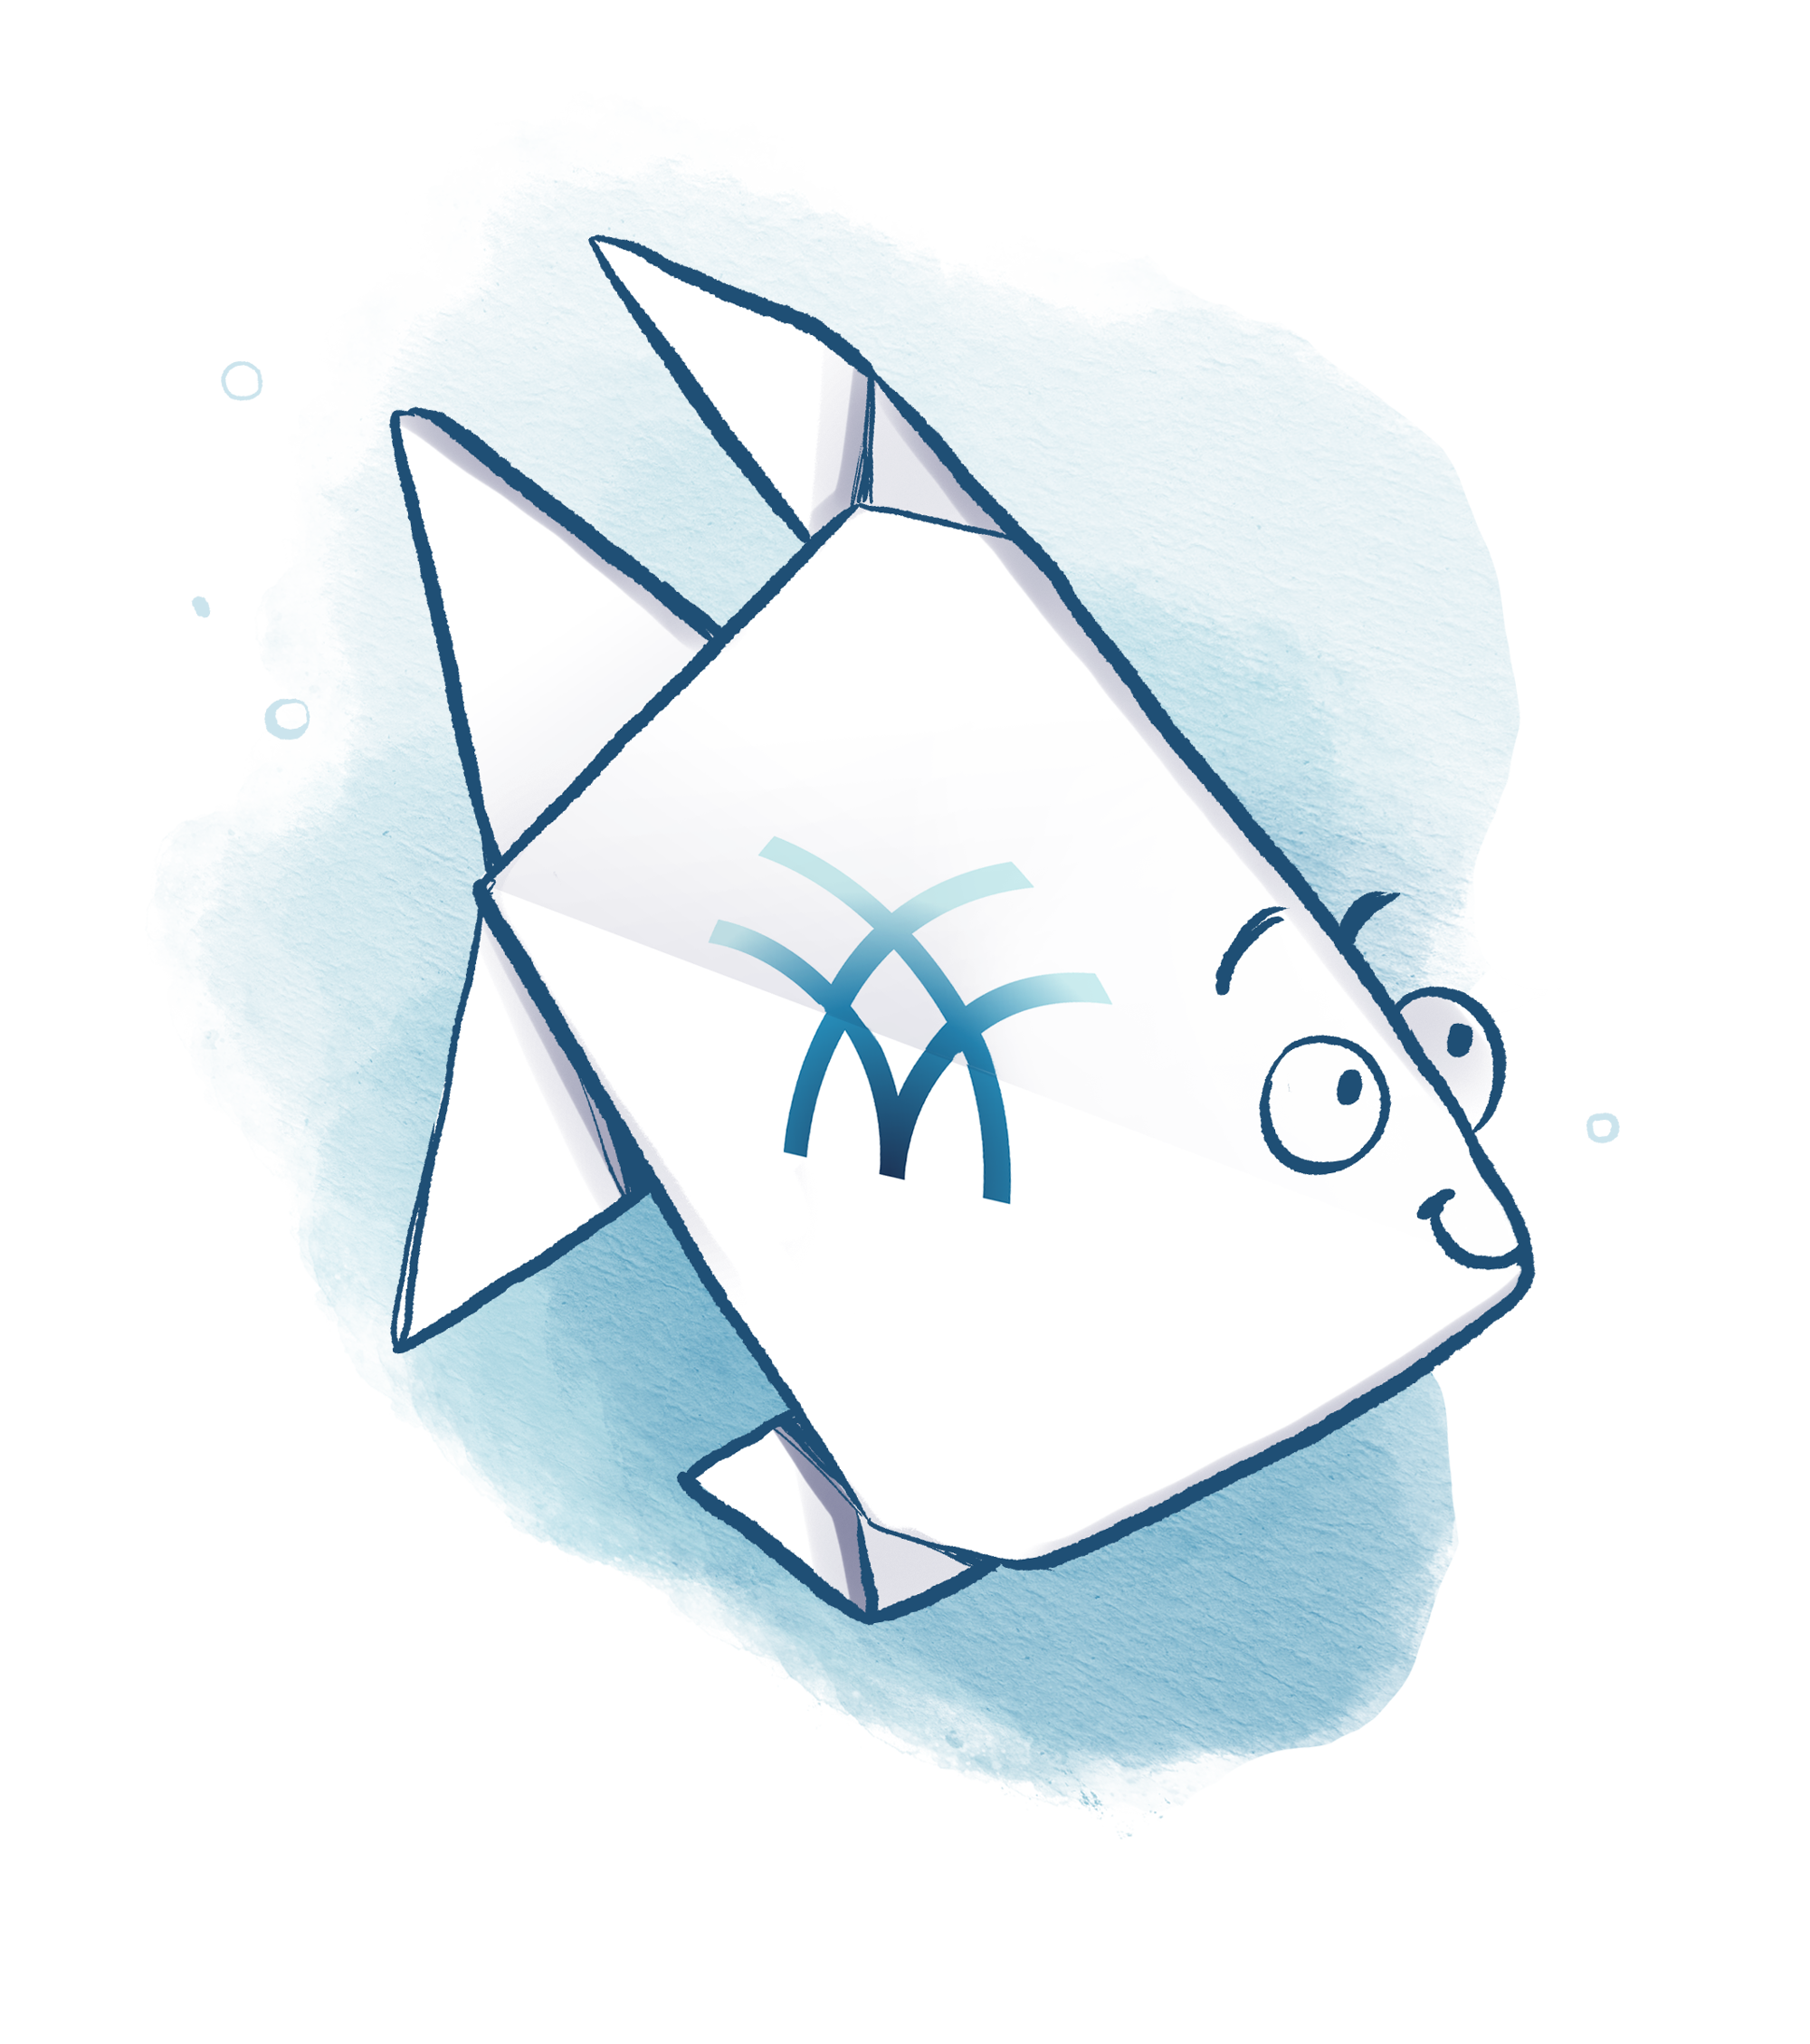 LORI - The BlueMed SaiLORIgami